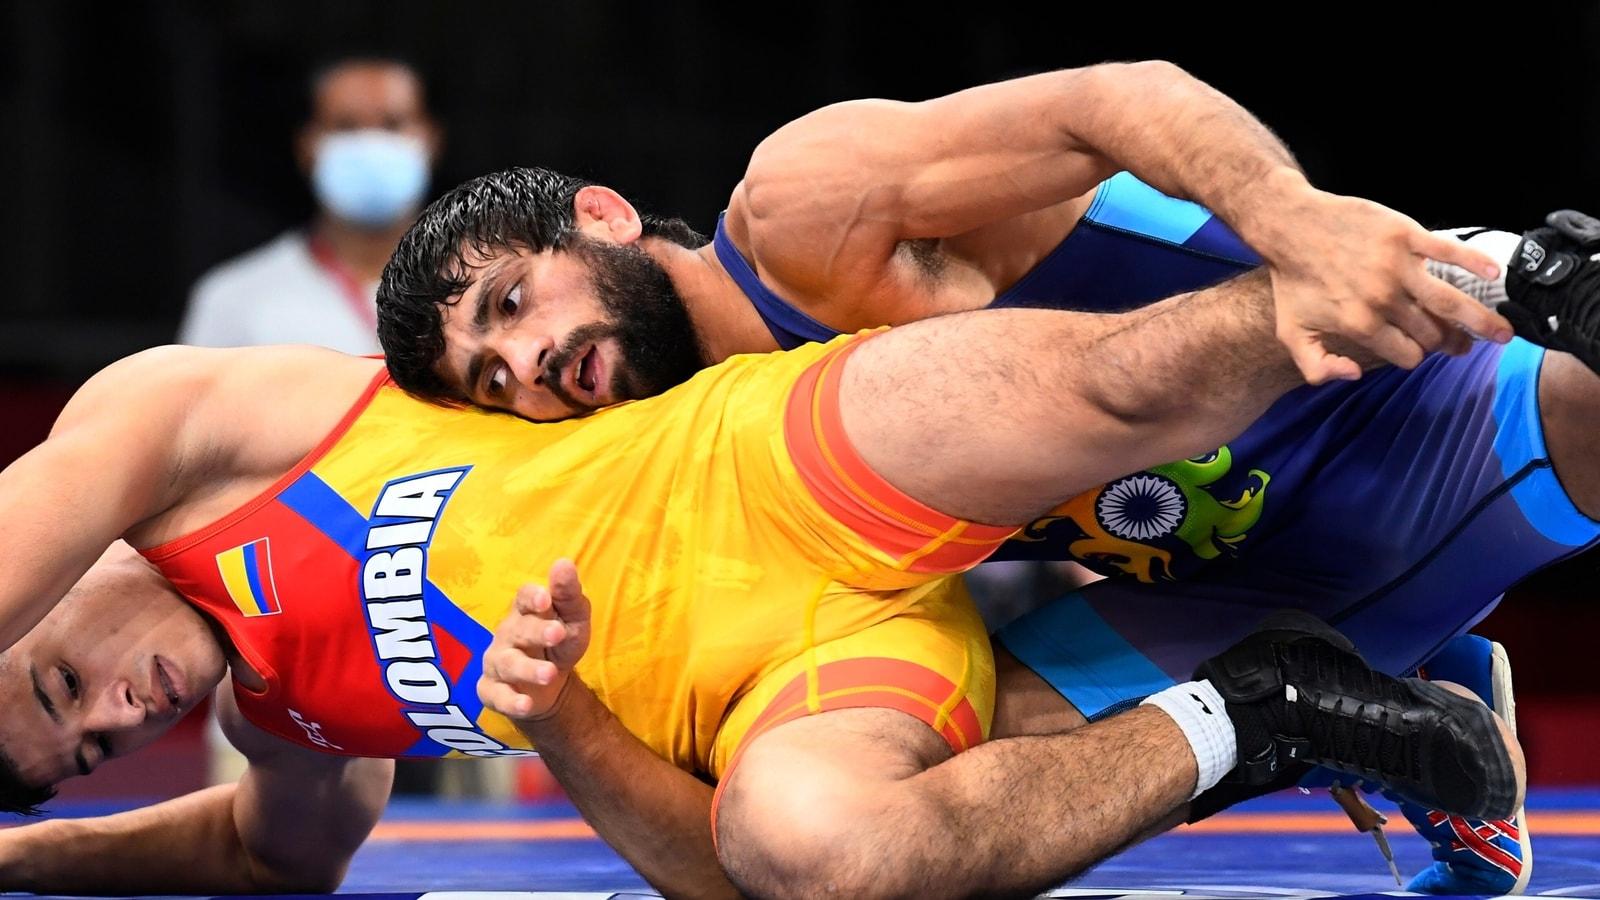 Tokyo Olympics: Ravi Kumar Dahiya ensures at least a silver medal for  India; enters men's freestyle 57kg wrestling final   Olympics - KreedOn